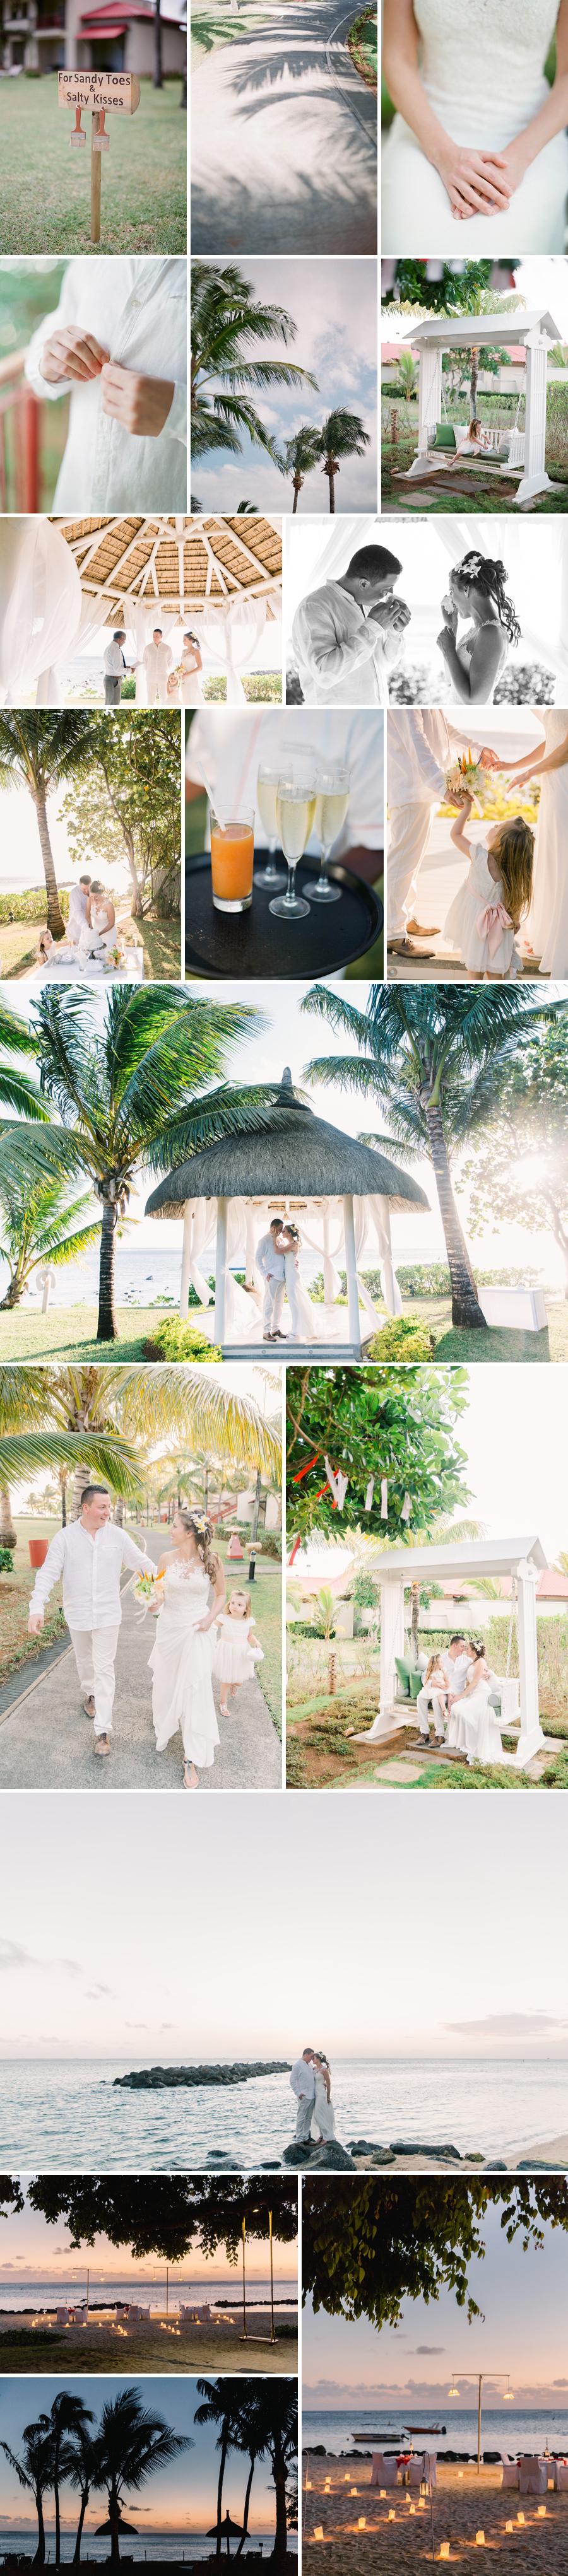 wedding mauritius photographer mariage île maurice